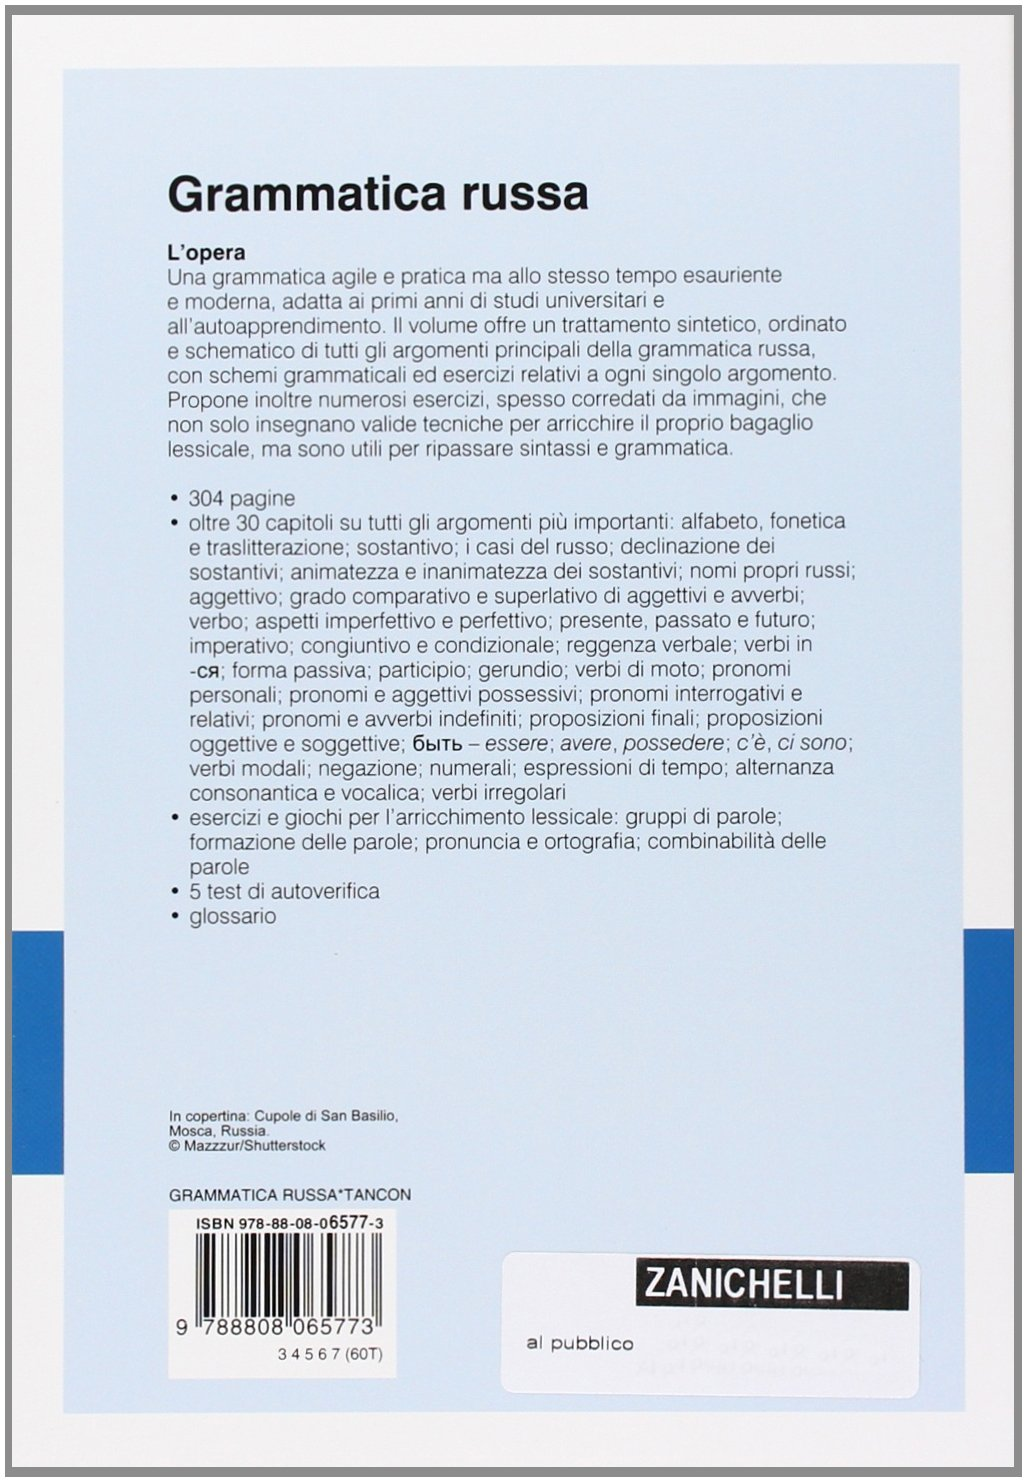 GRAMMATICA RUSSA ZANICHELLI PDF DOWNLOAD